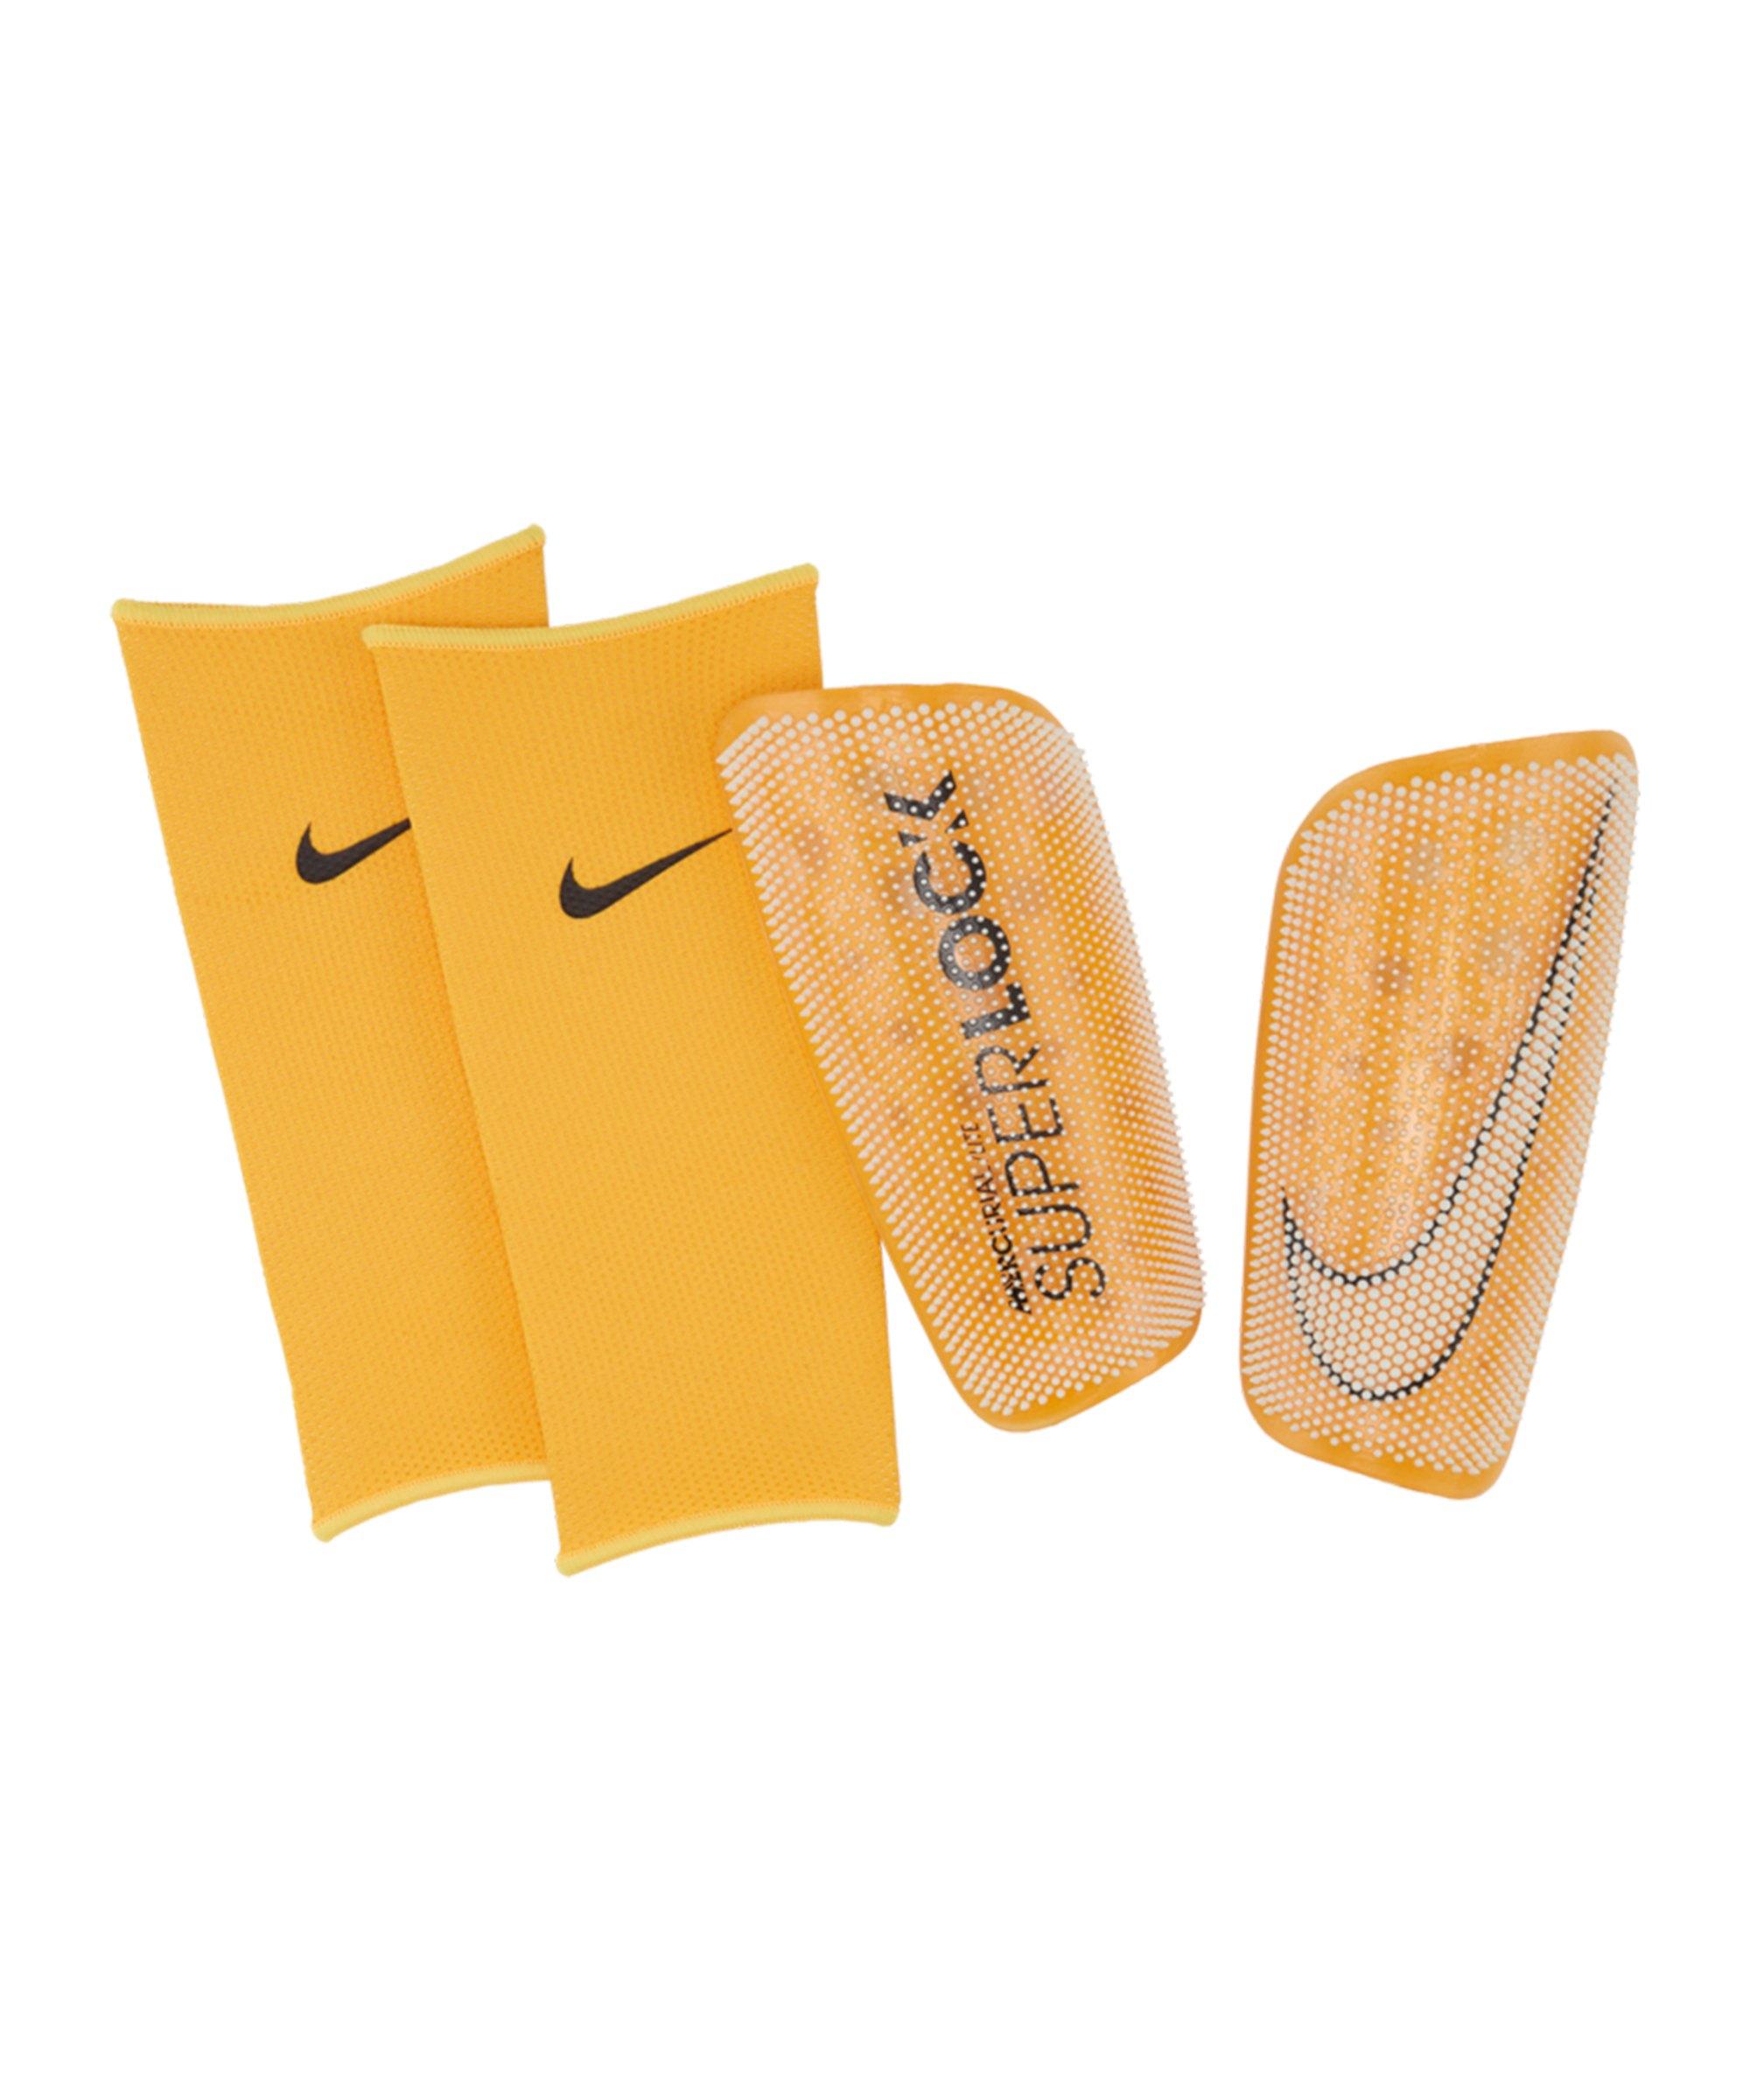 Nike Mercurial FlyLite Superlock Schoner Weiss Gelb F133 - orange